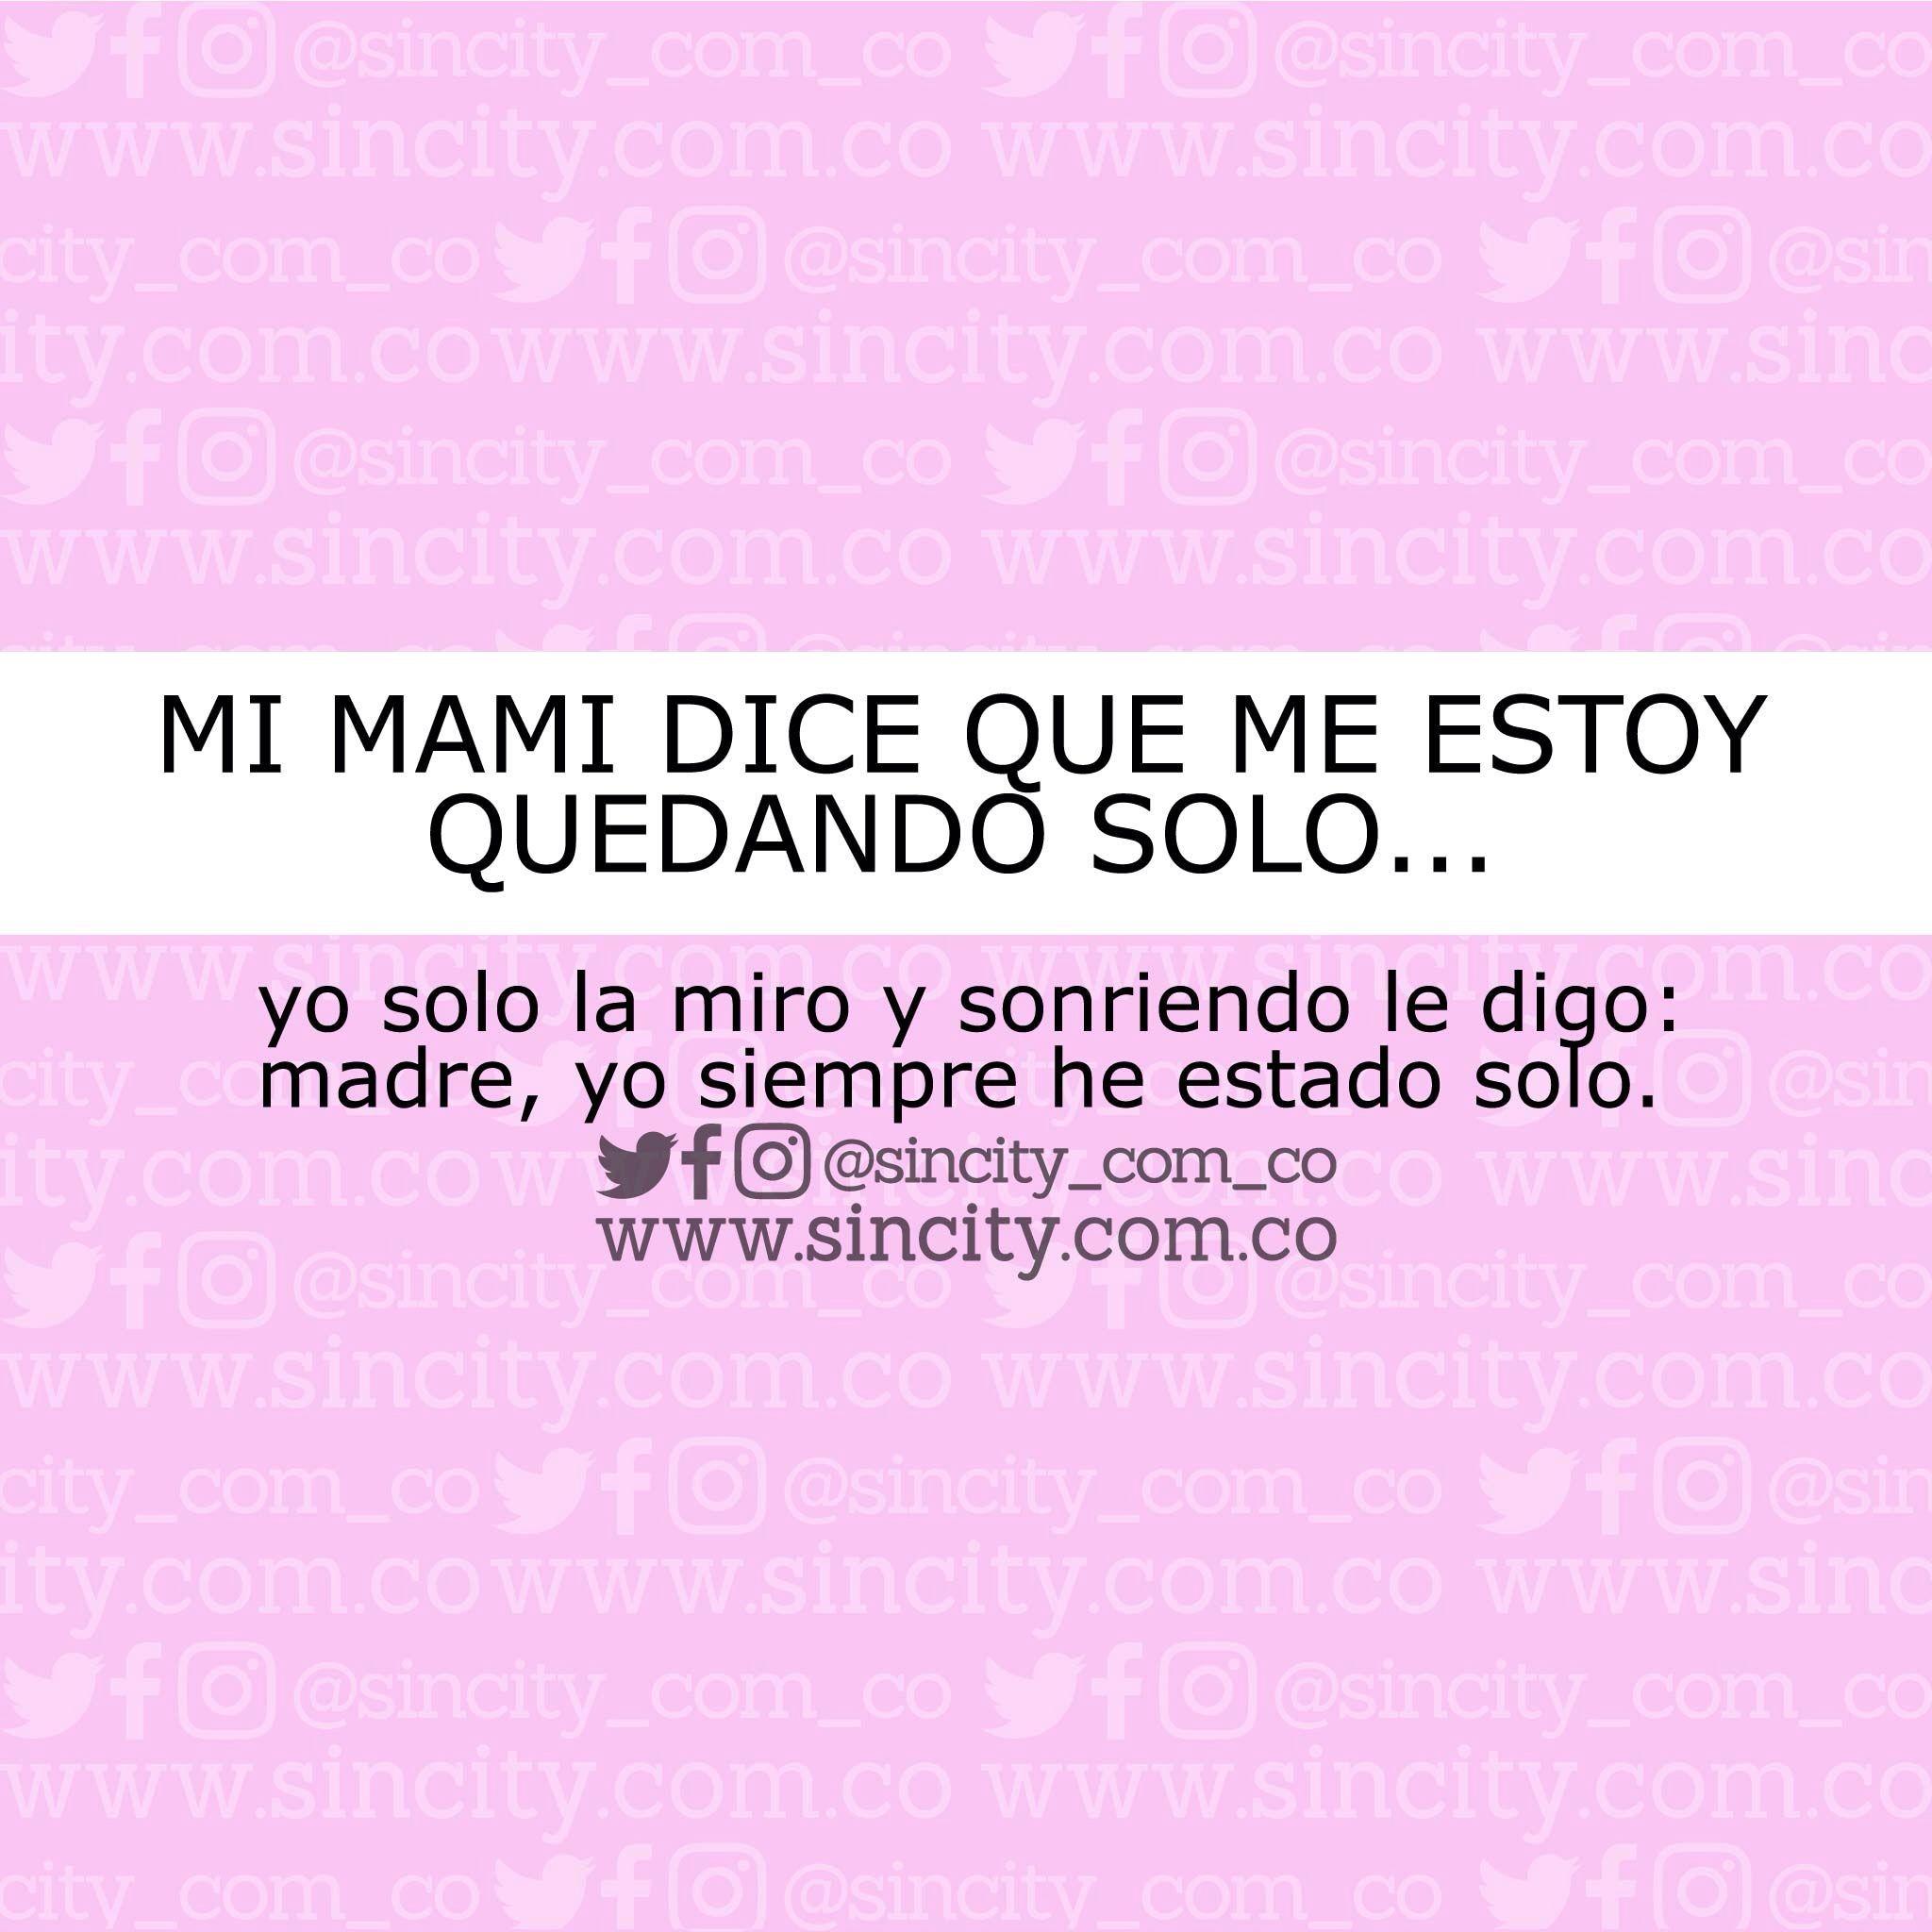 frases frasessincity sincity sincitycolombia colombia mami mama madre meestoyquedandosolo soledad